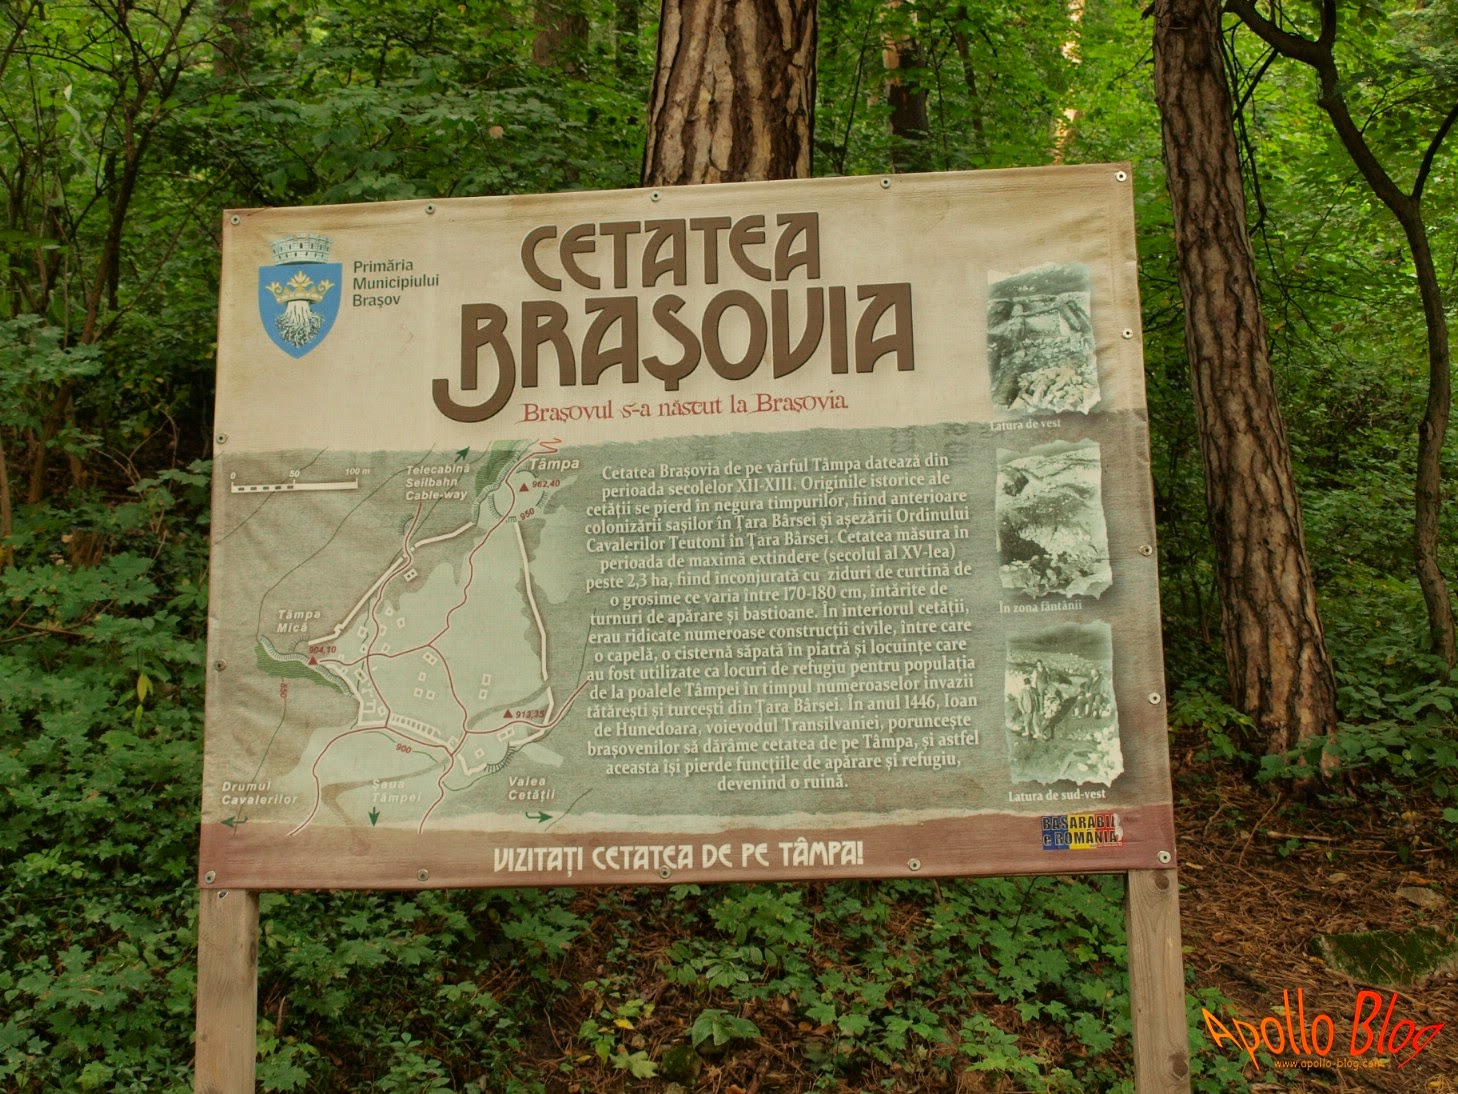 Cetatea Brasovia